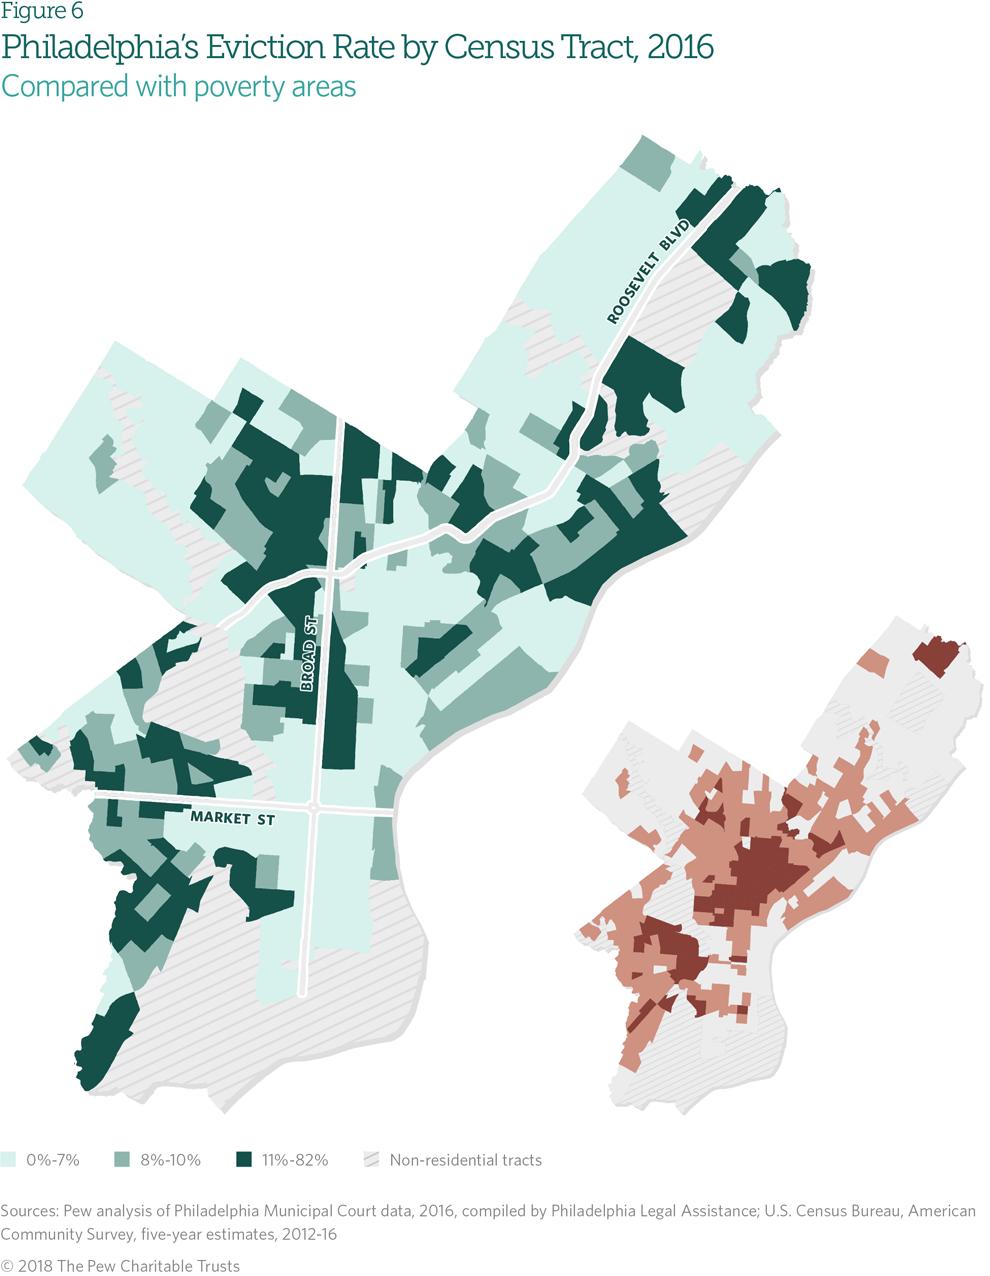 Philadelphia's Poor: Experiences From Below the Poverty Line